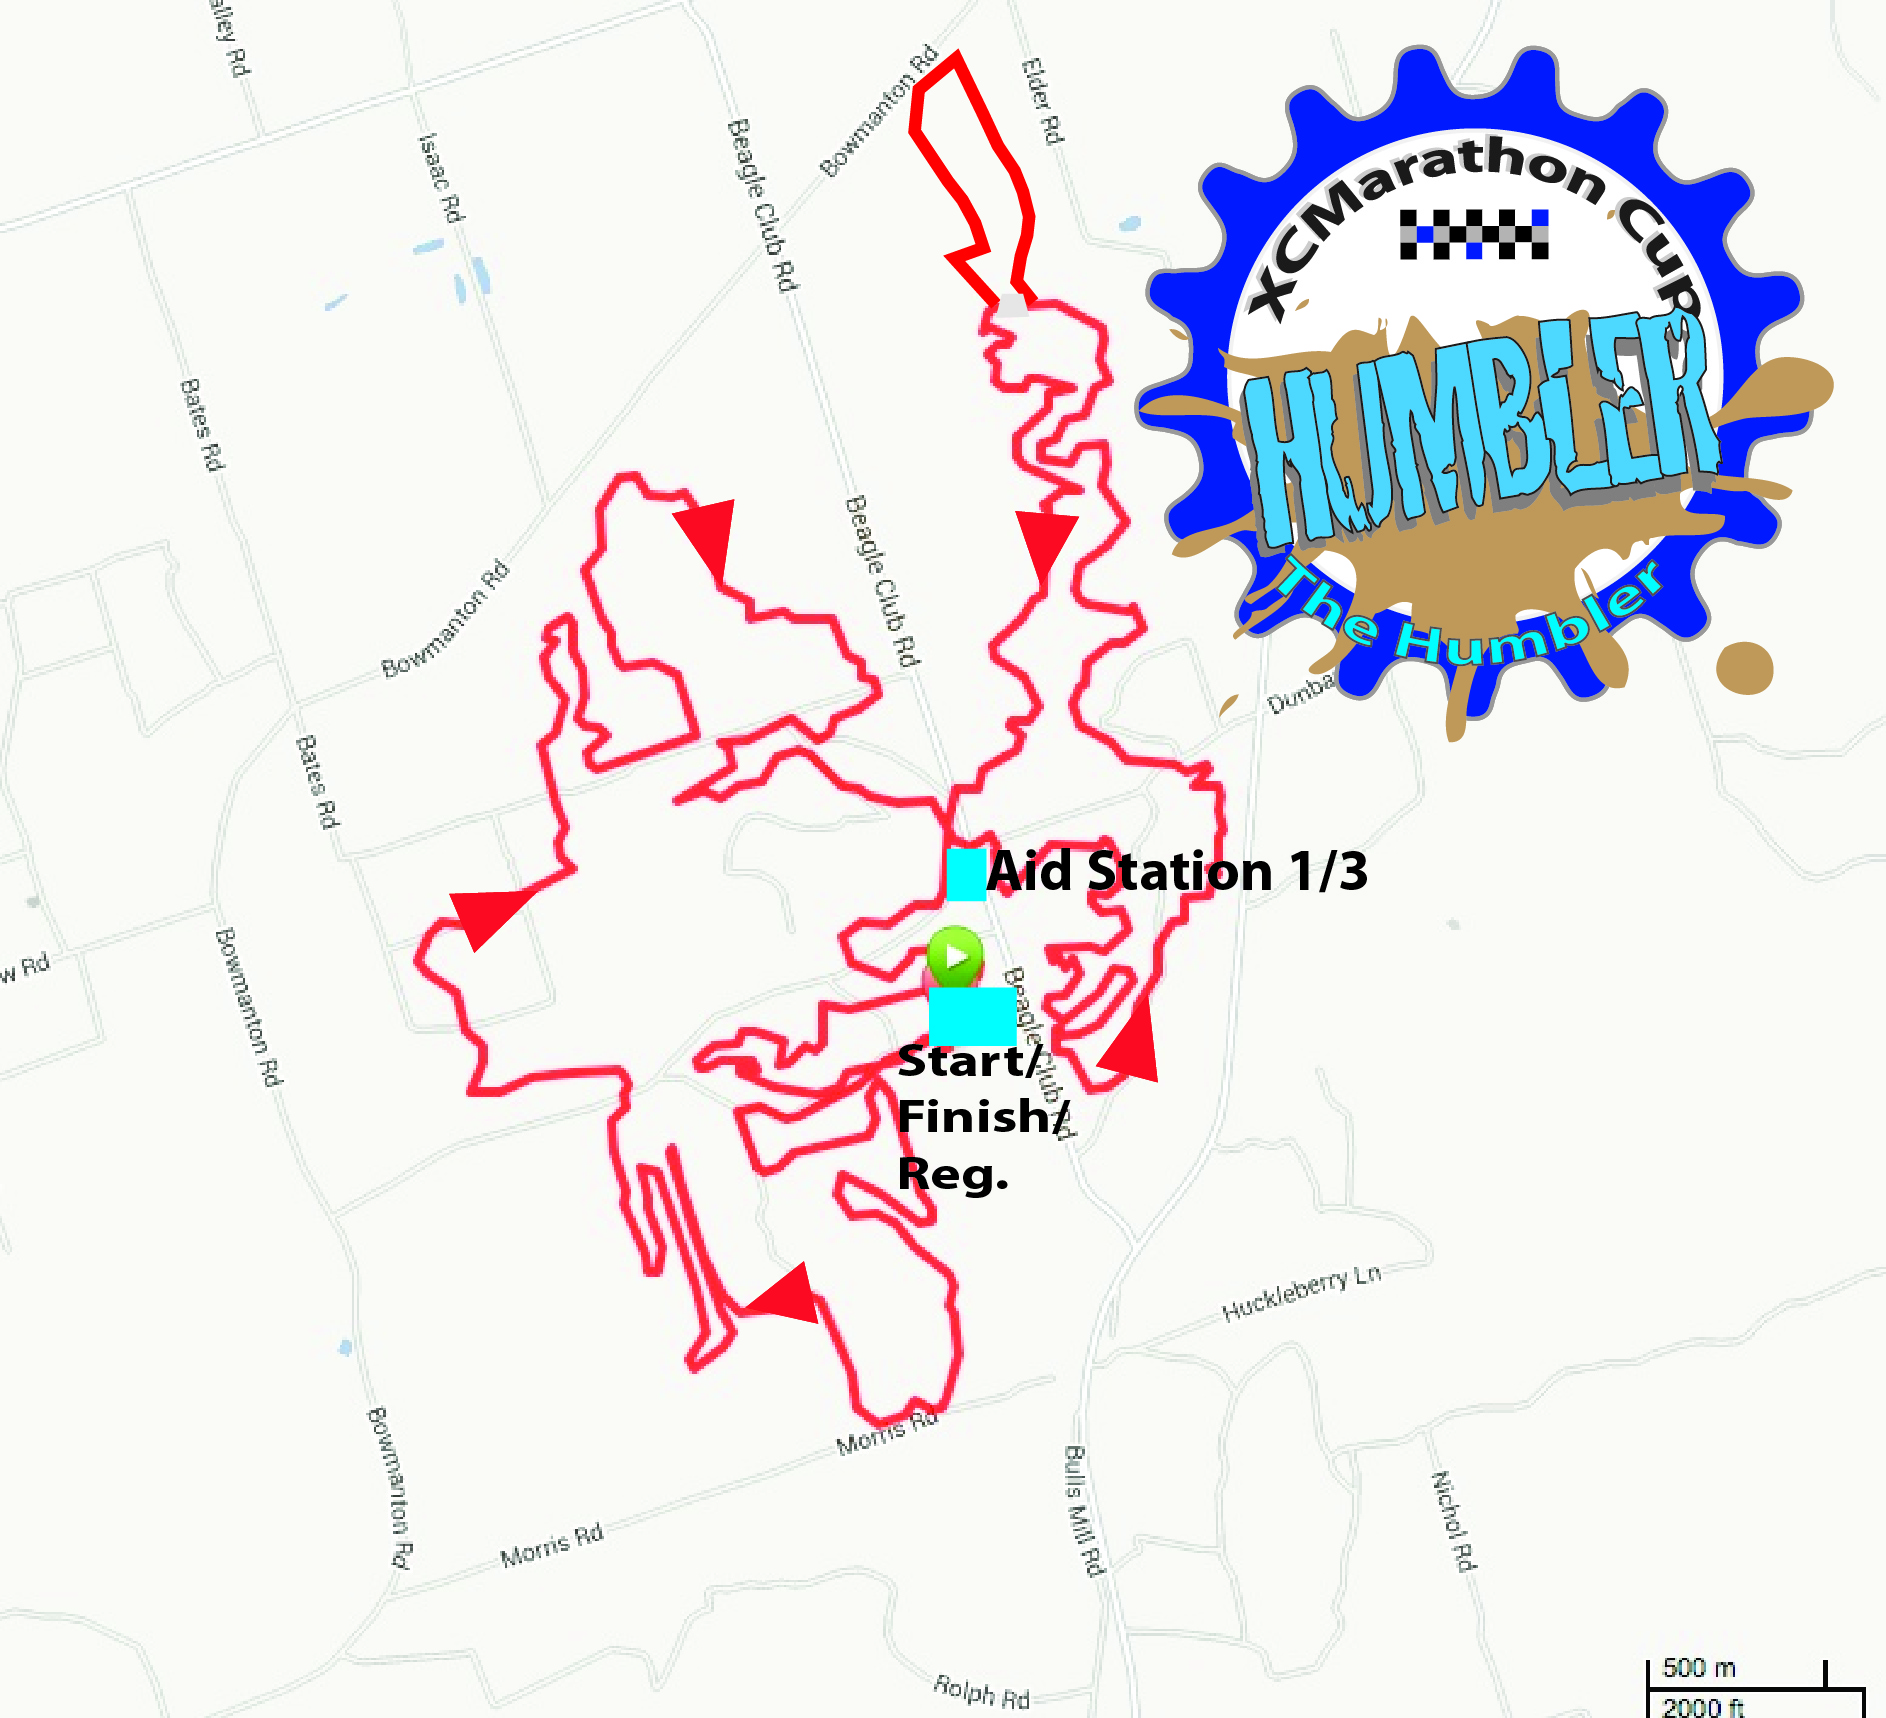 Humbler course 2016